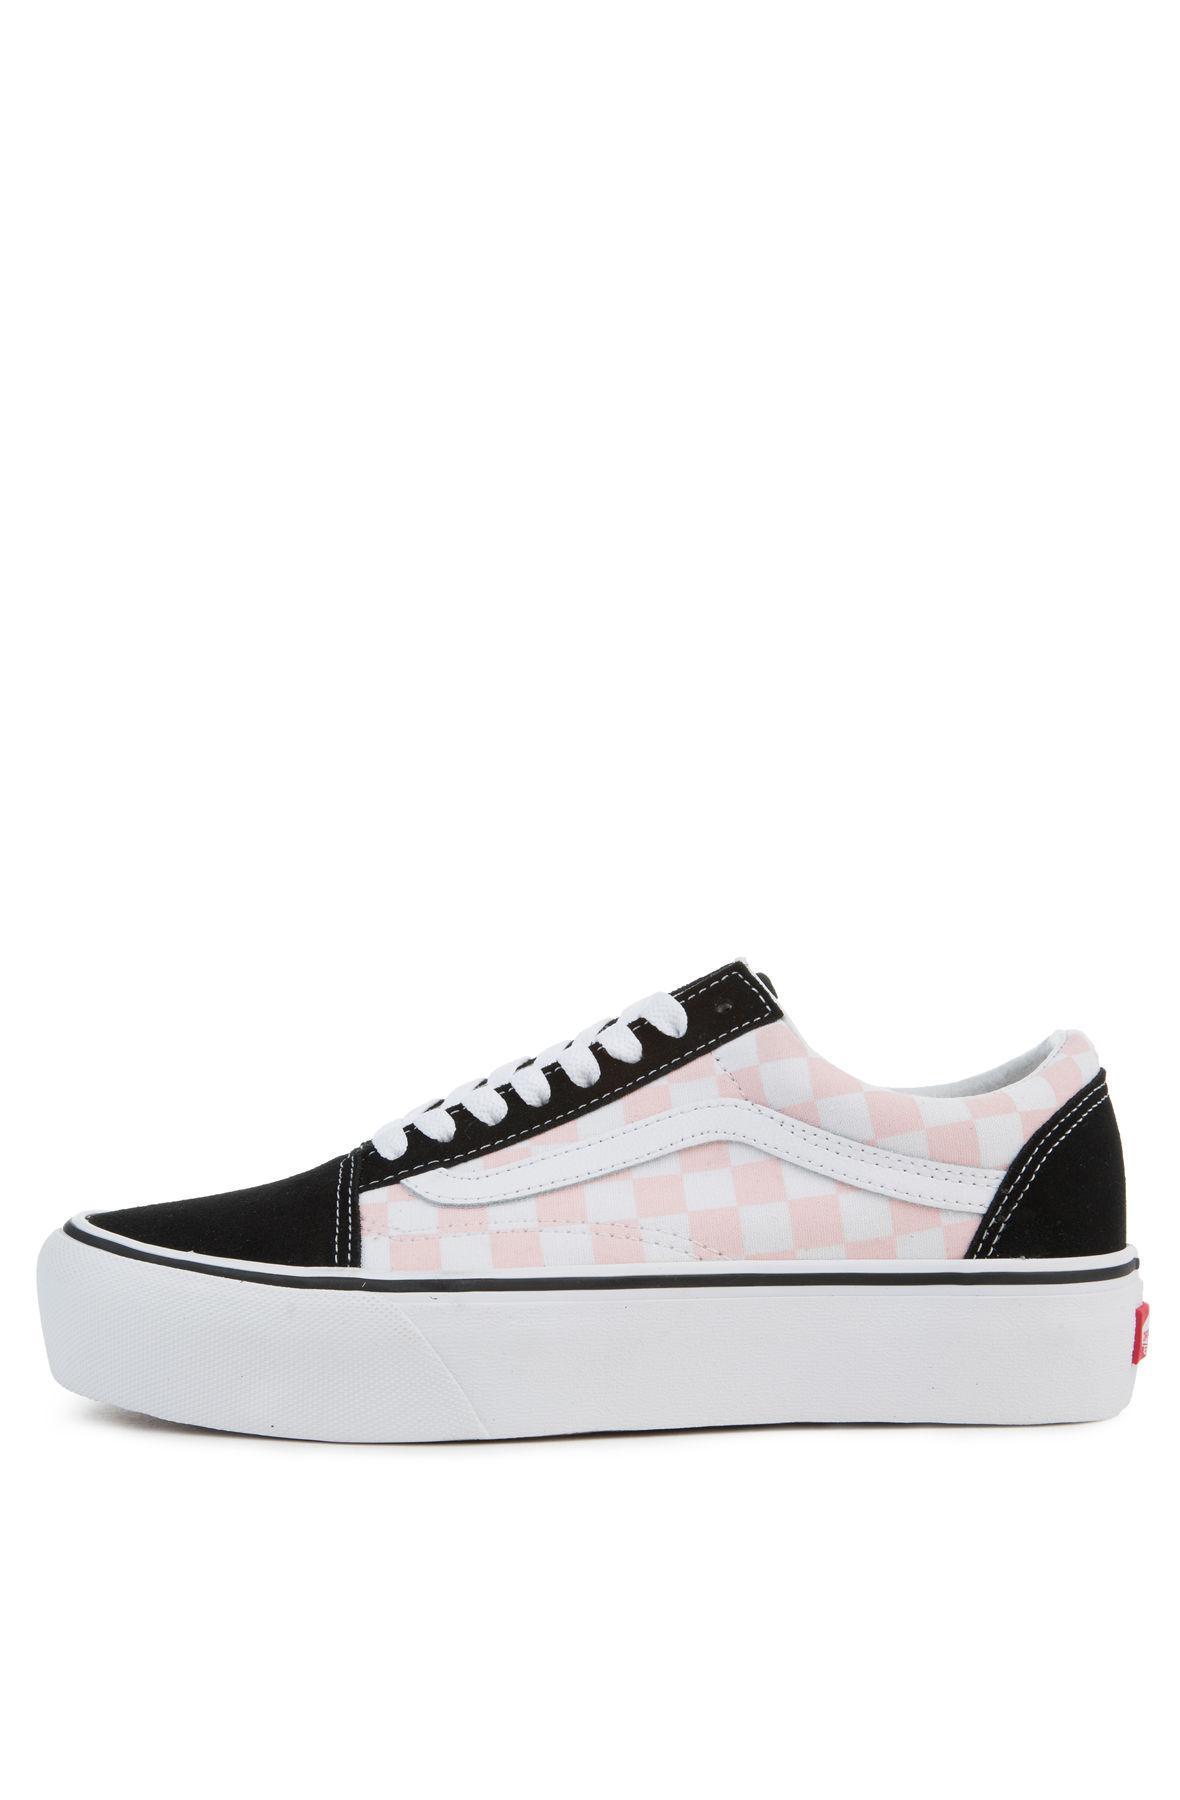 Lyst - Vans The Women s Old Skool Platform In Checkerboard Black And ... f8c53c967